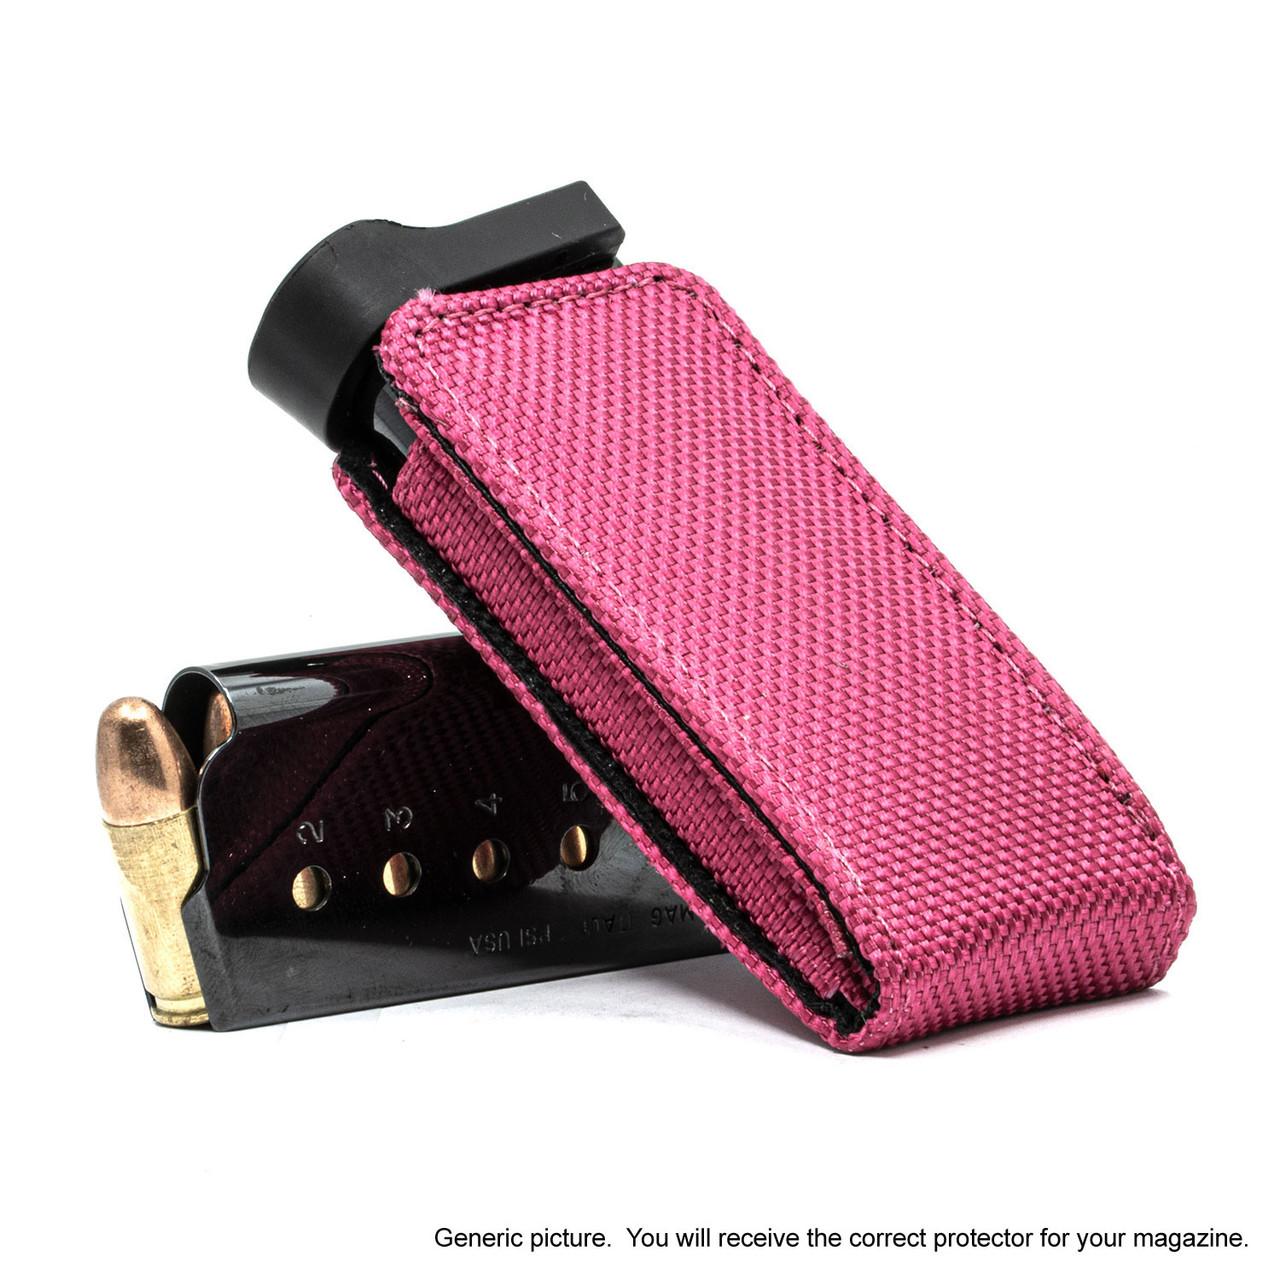 Colt Mark IV Series 80 (.380) Pink Covert Magazine Pocket Protector